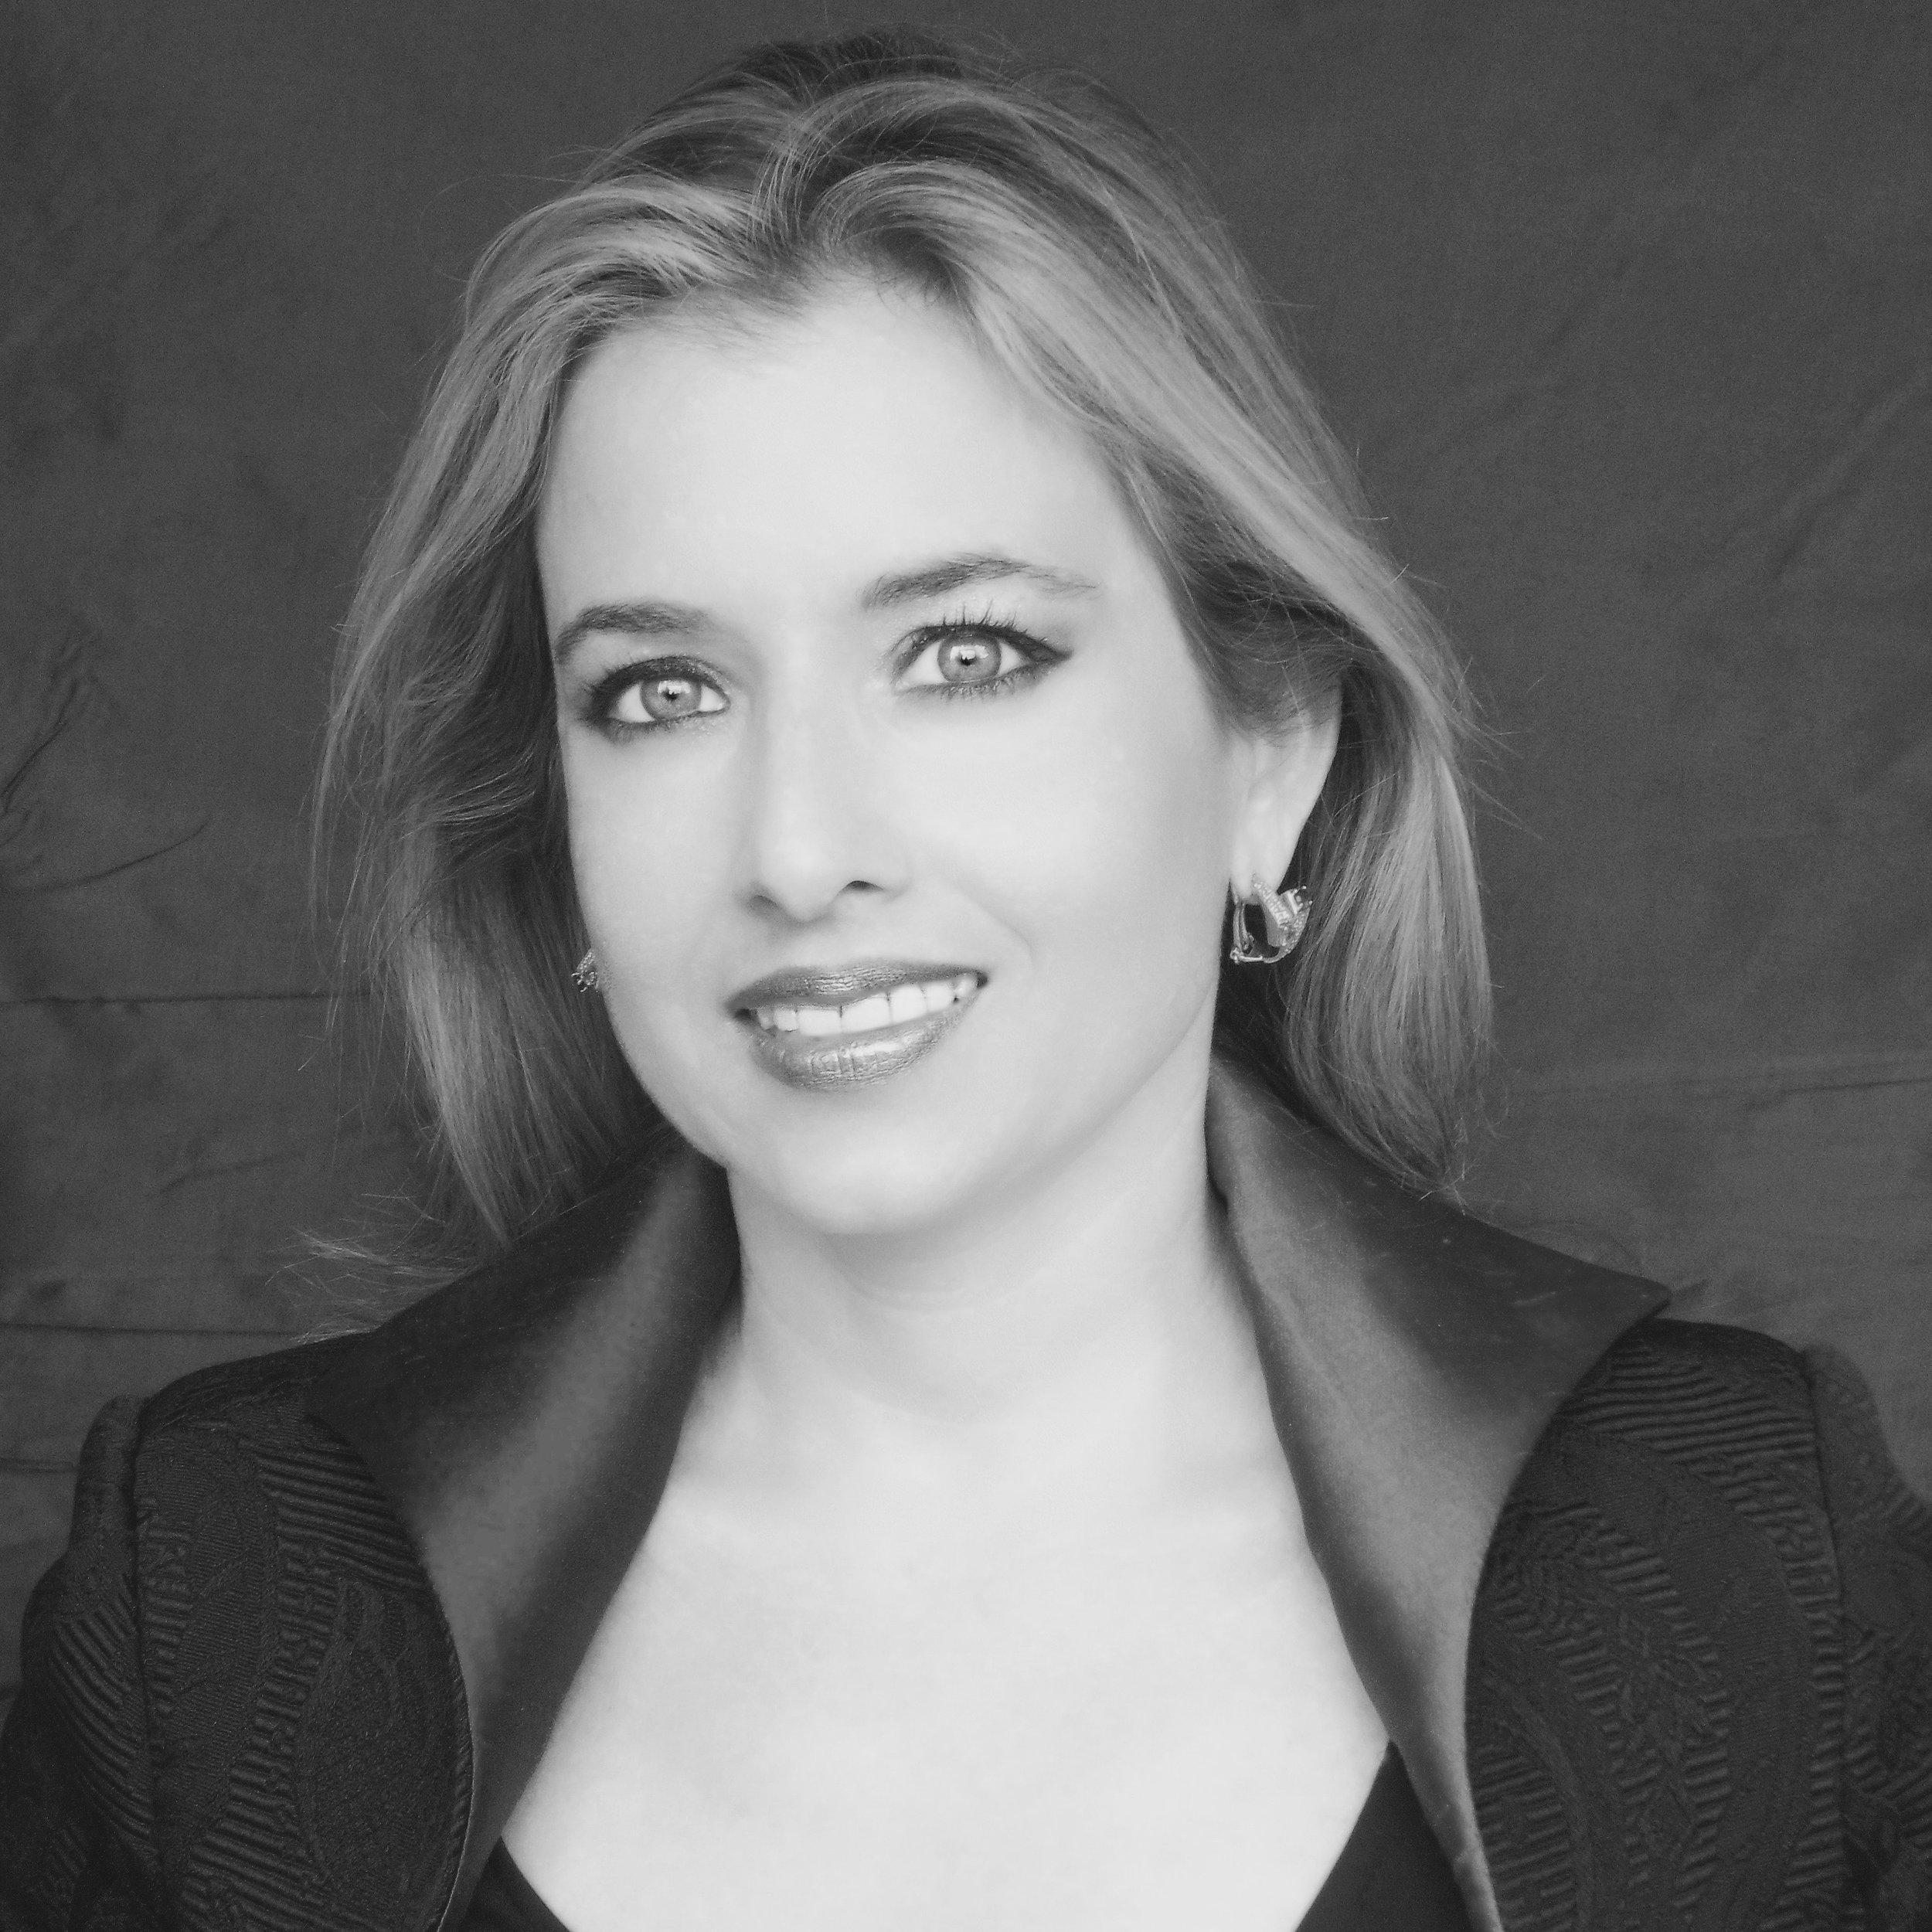 Tammy Apostol, Regional Director, Fashion Group international South Florida